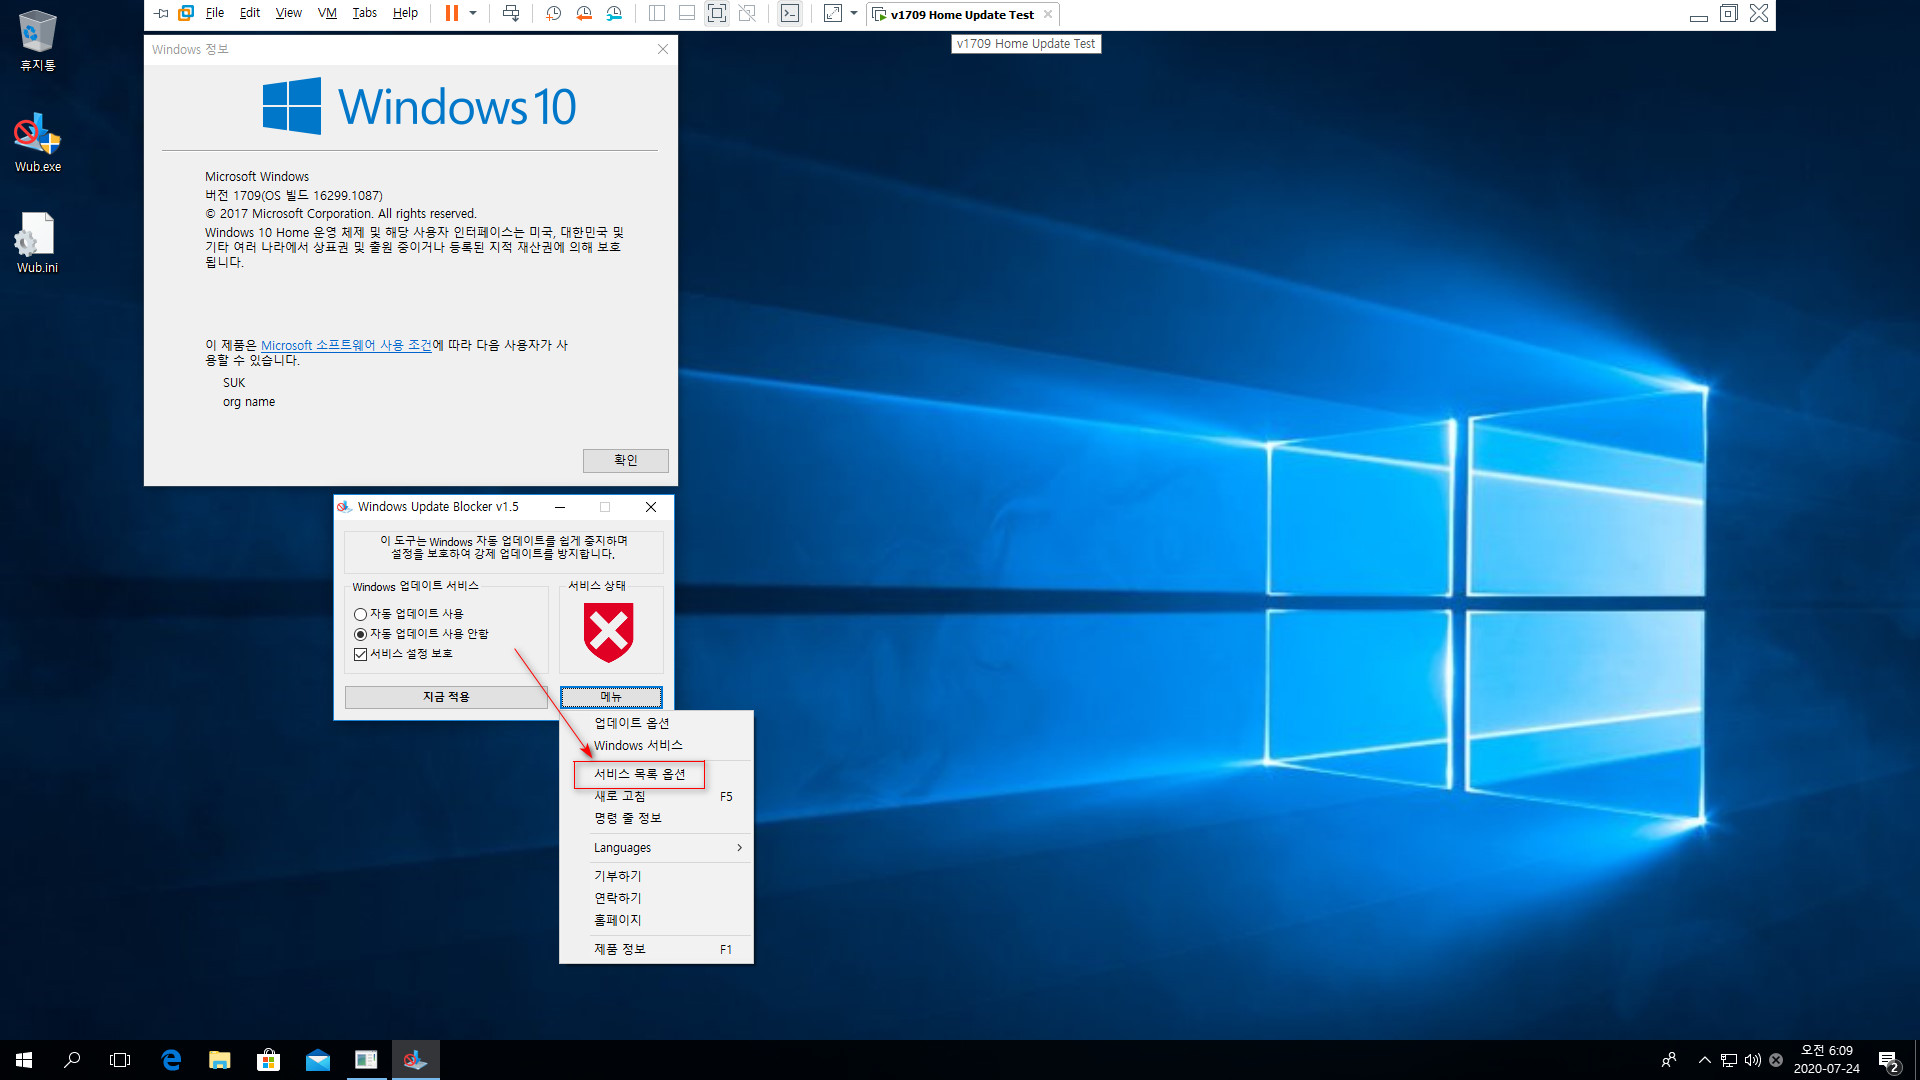 Windows Update Blocker v1.5 업데이트 방지 테스트 - 윈도우는 버전 1709으로 현재 강제 업데이트 중인 버전이고 홈 에디션 2020-07-24_060926.jpg